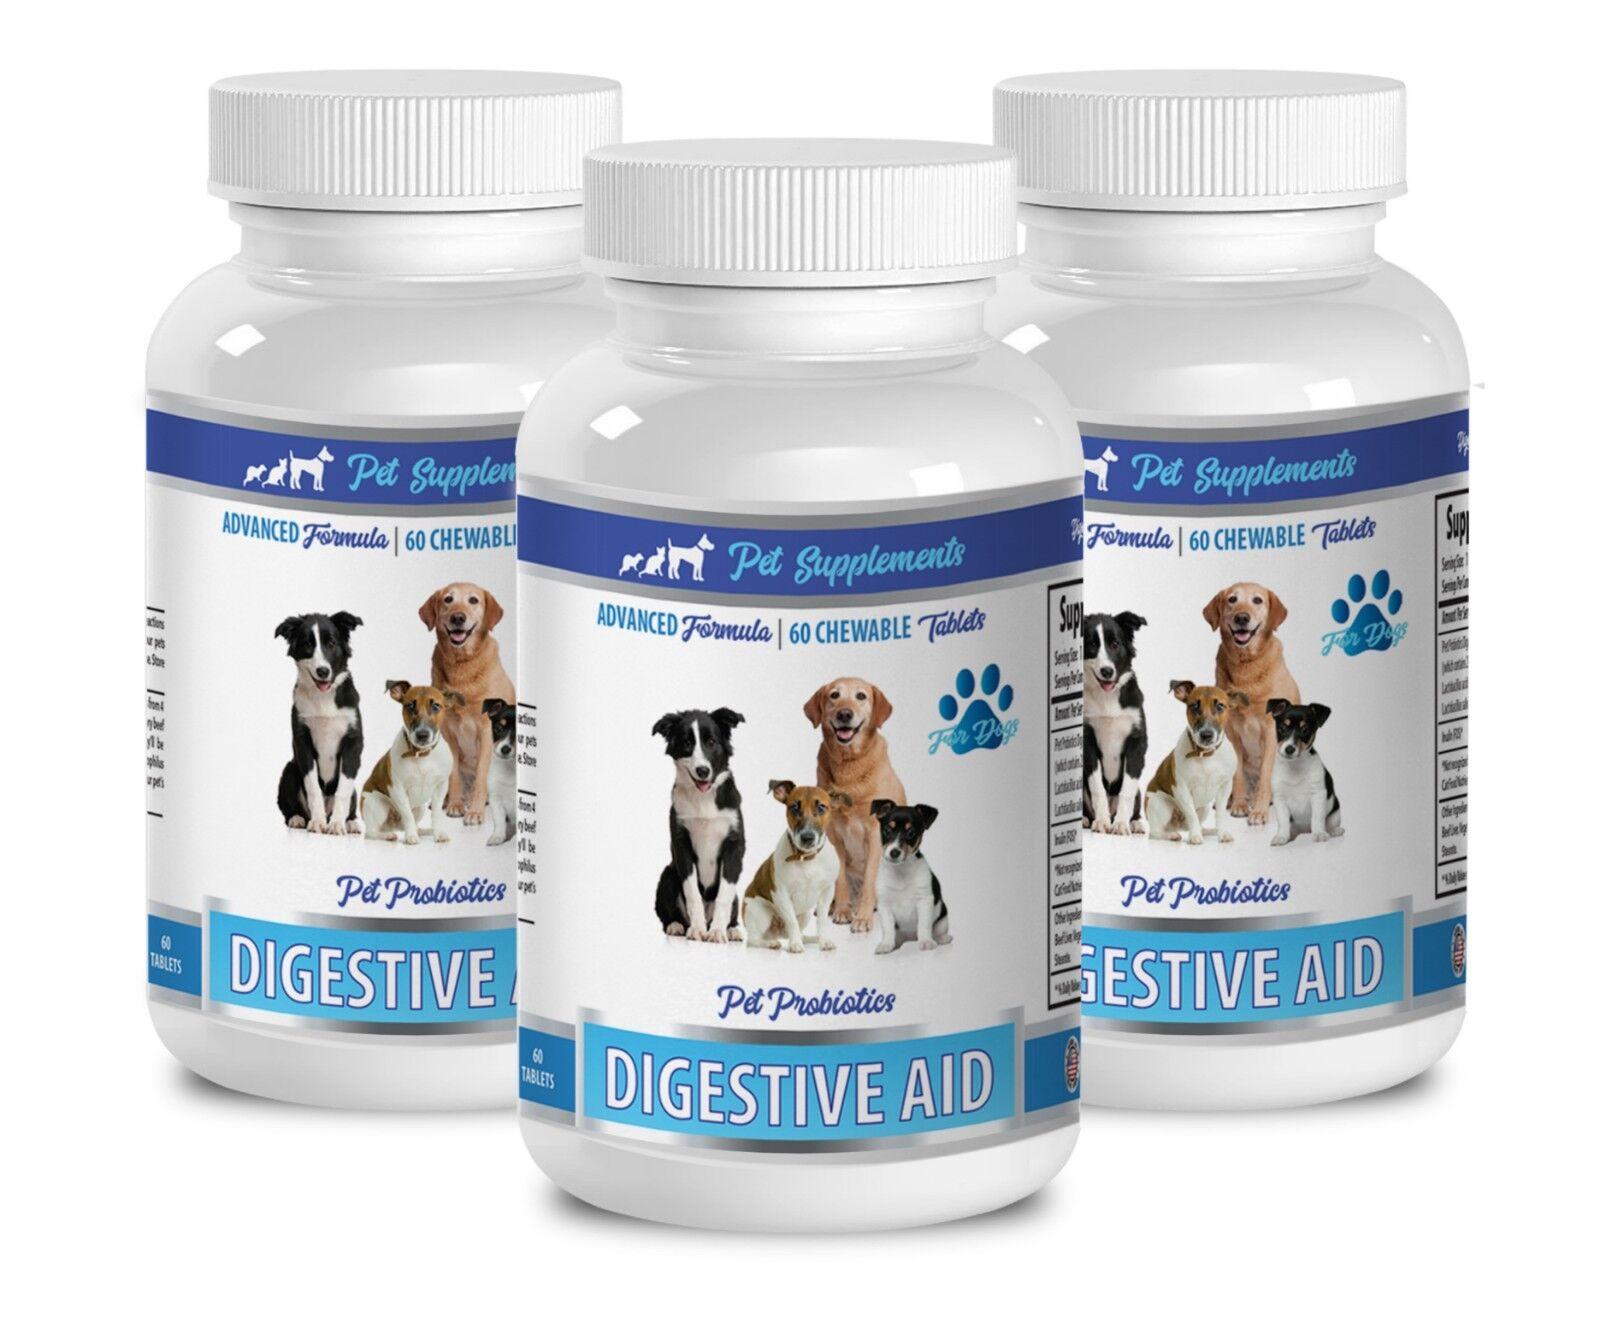 Dogs digestive enzymes - DOG DIGESTIVE AID 3B - dog supplement digestive